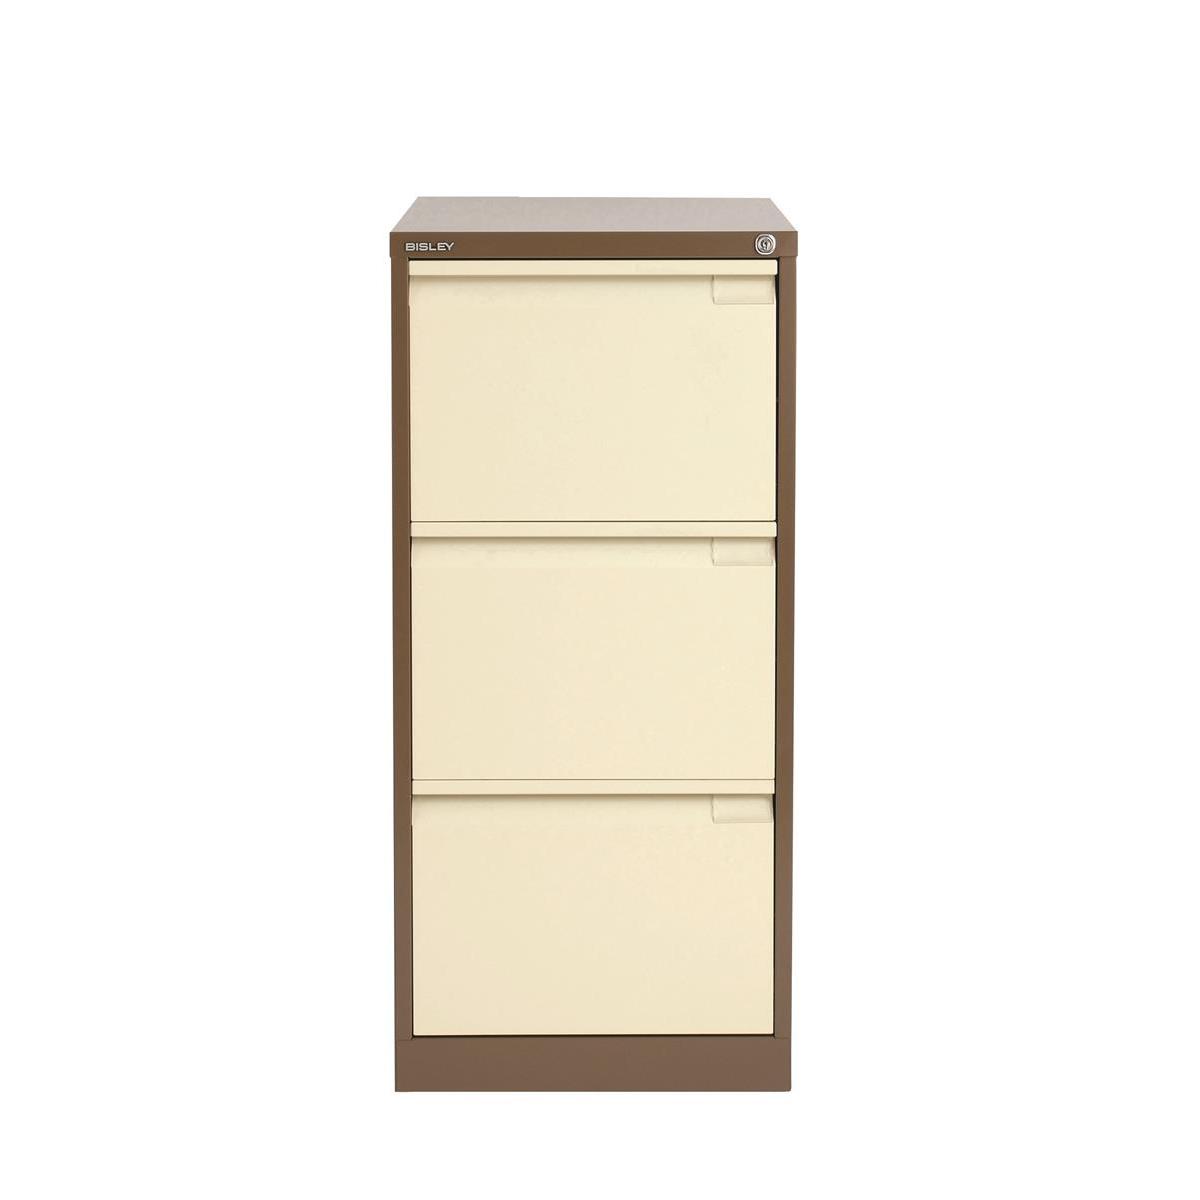 Filing cabinets or accesories Bisley Filing Cabinet 470x622x1016mm Ref 1633-av5av6